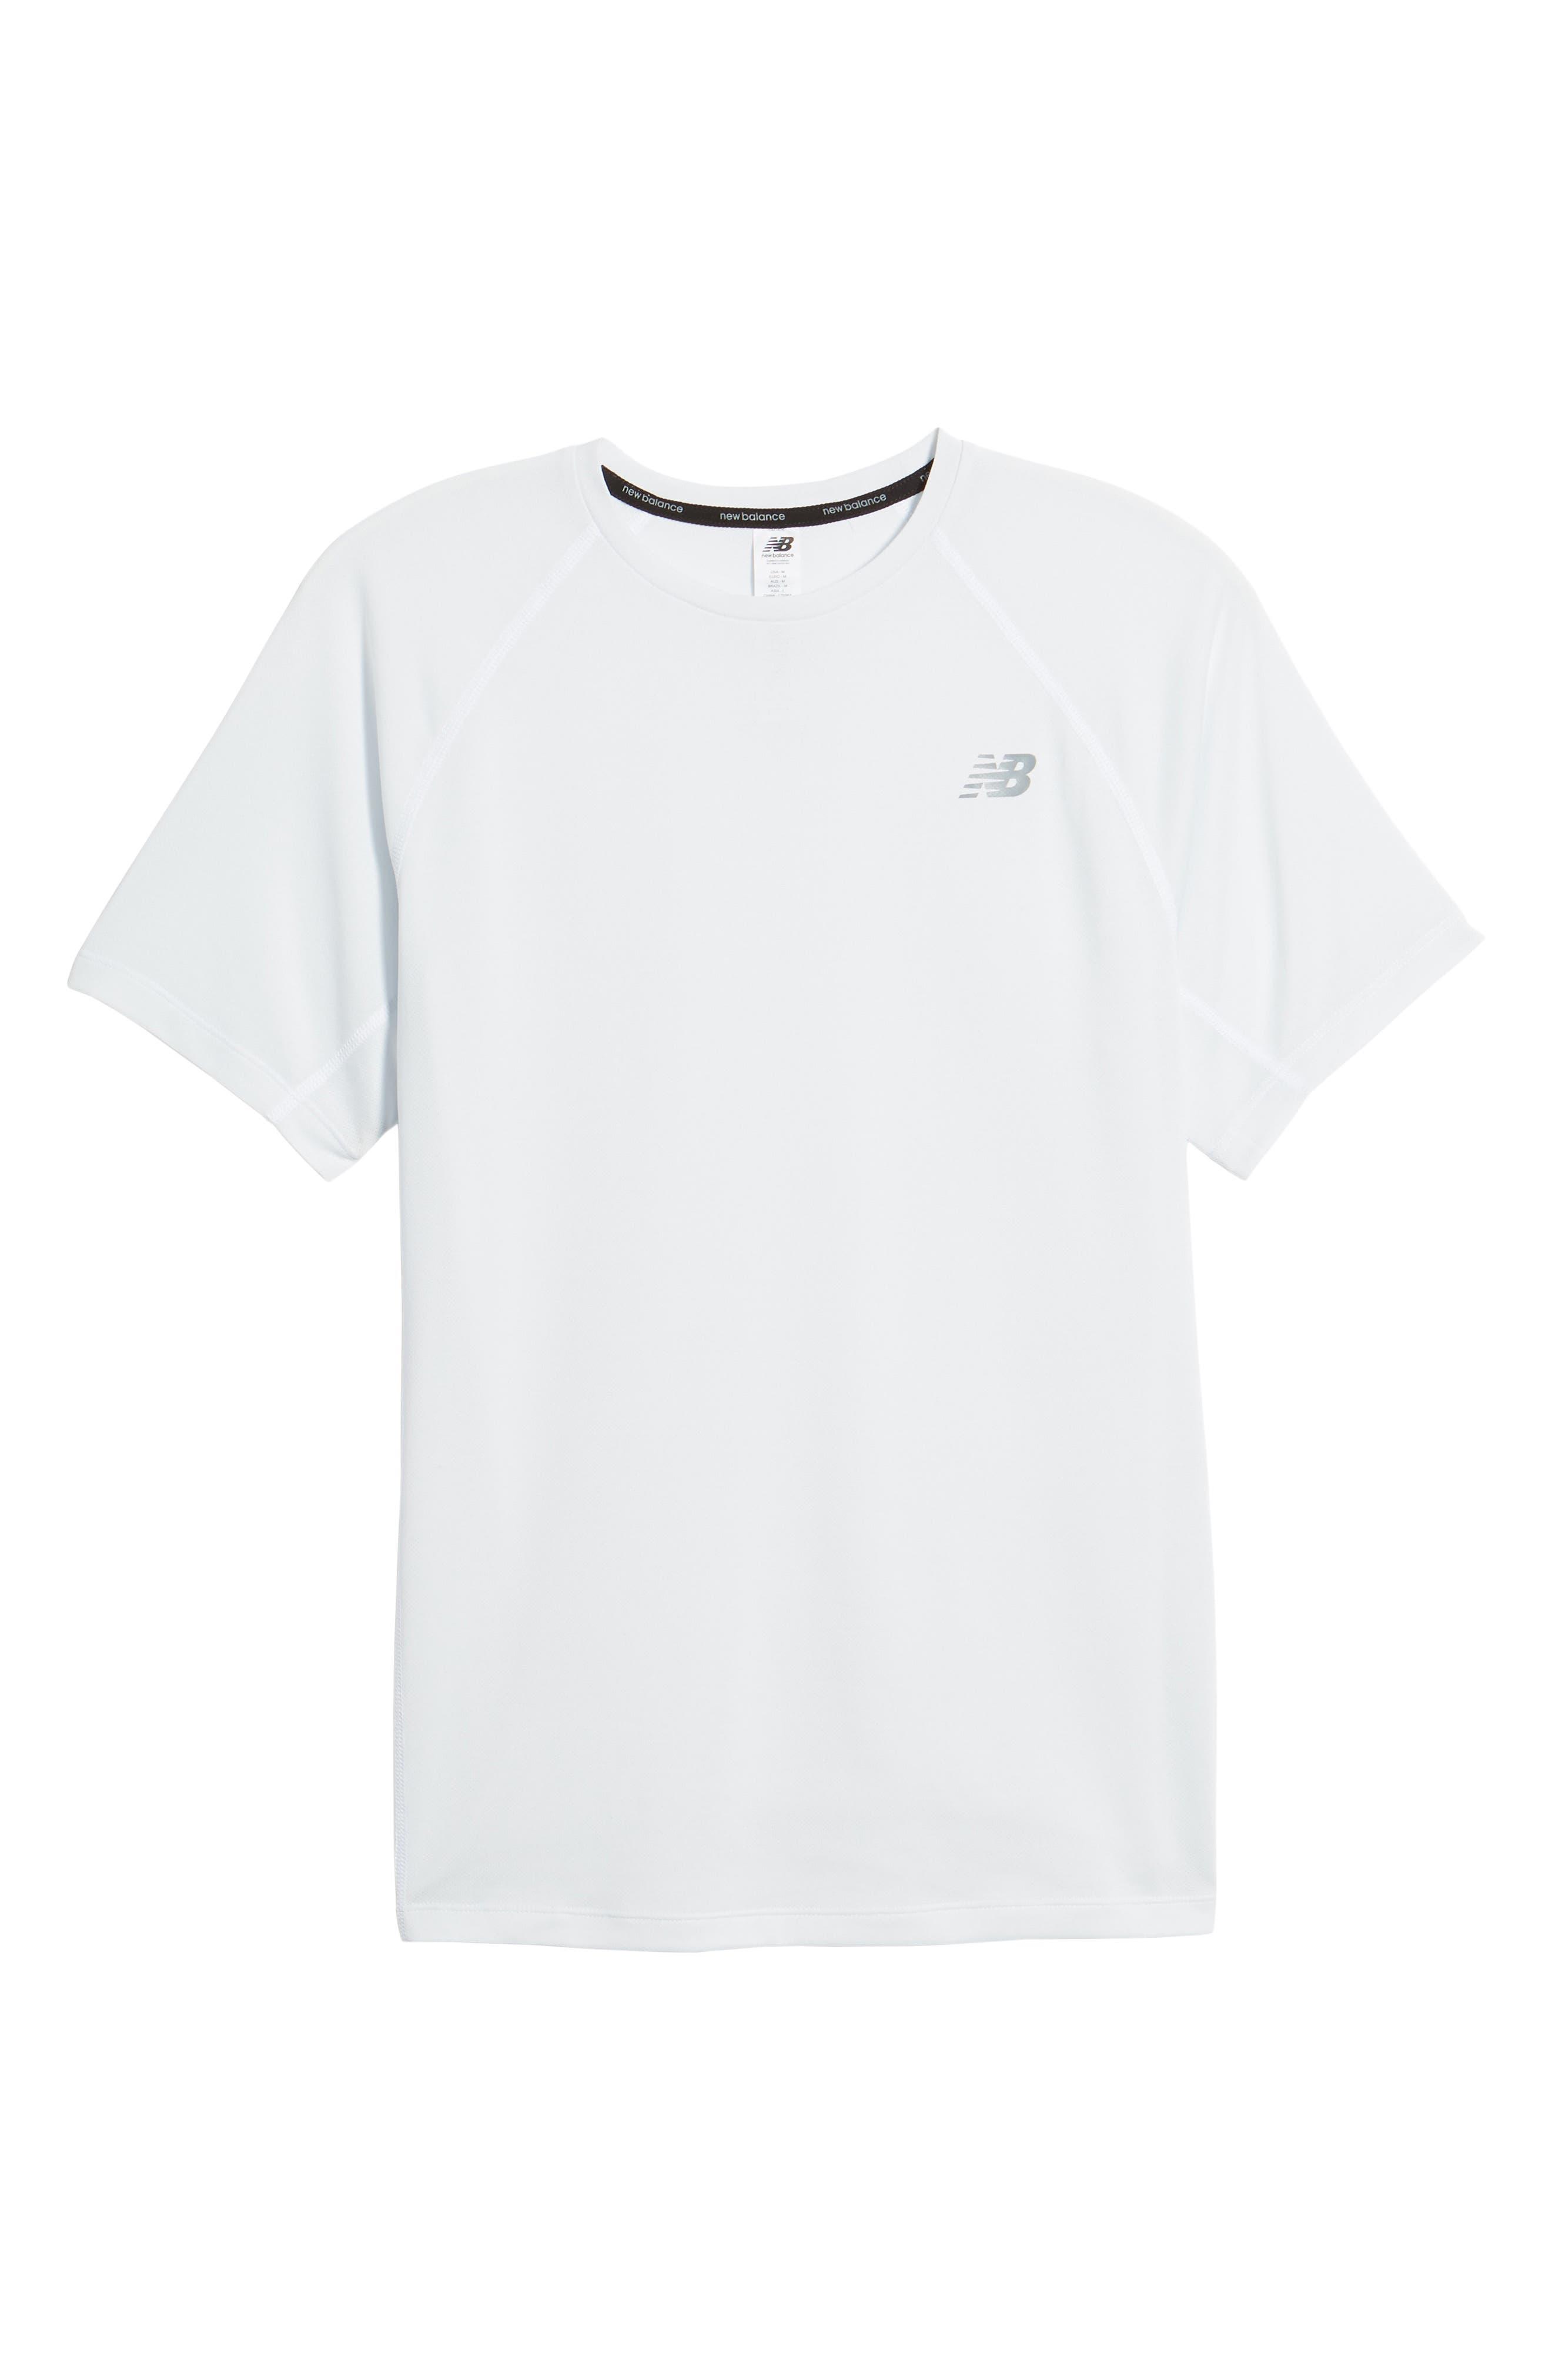 Tenacity Crewneck T-Shirt,                             Alternate thumbnail 6, color,                             WHITE